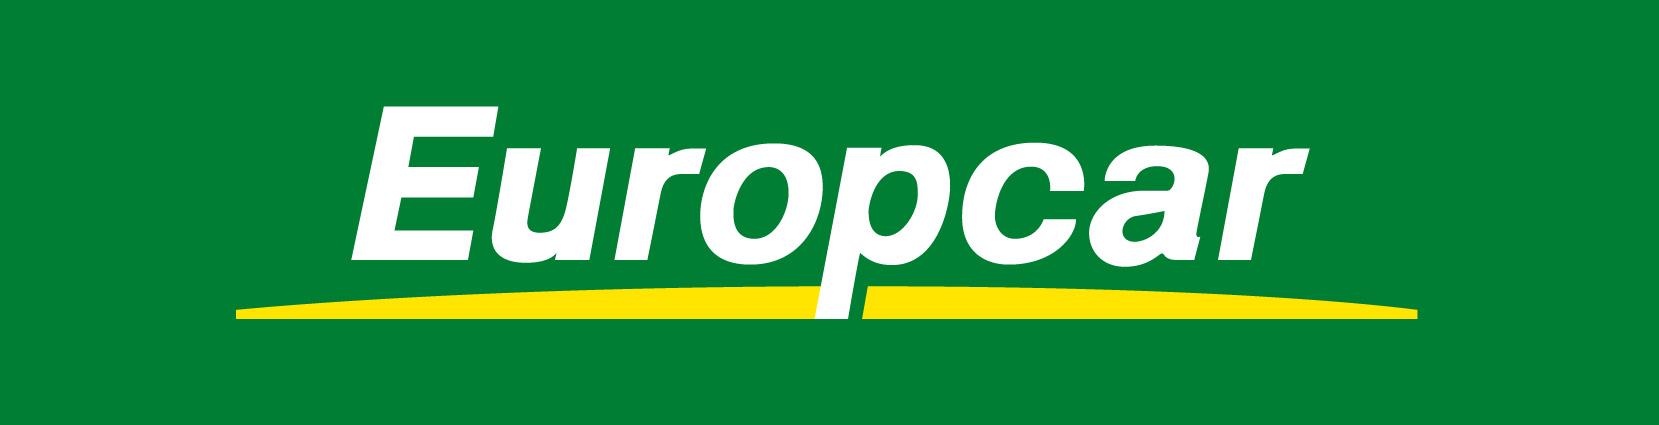 Europcar Car & Truck Rental Logo